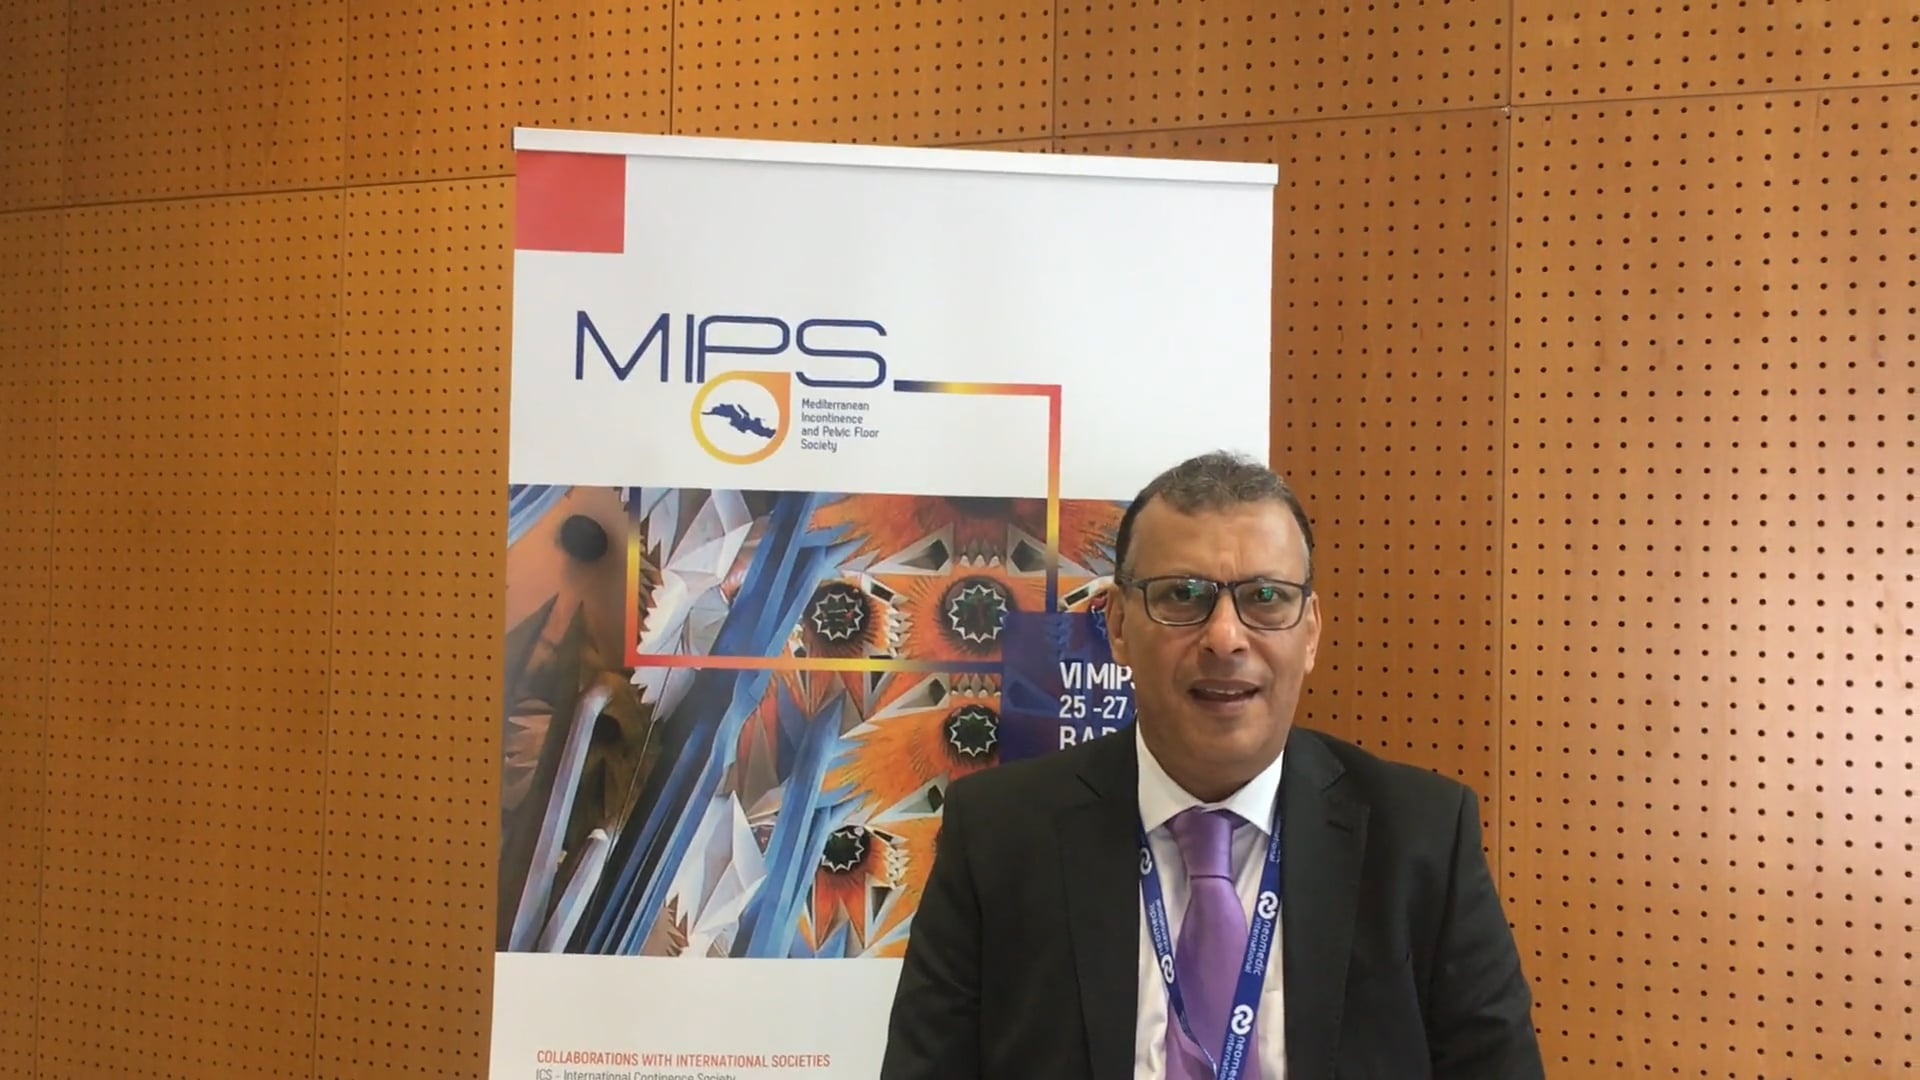 MIPS 2019 SOUVENIRS